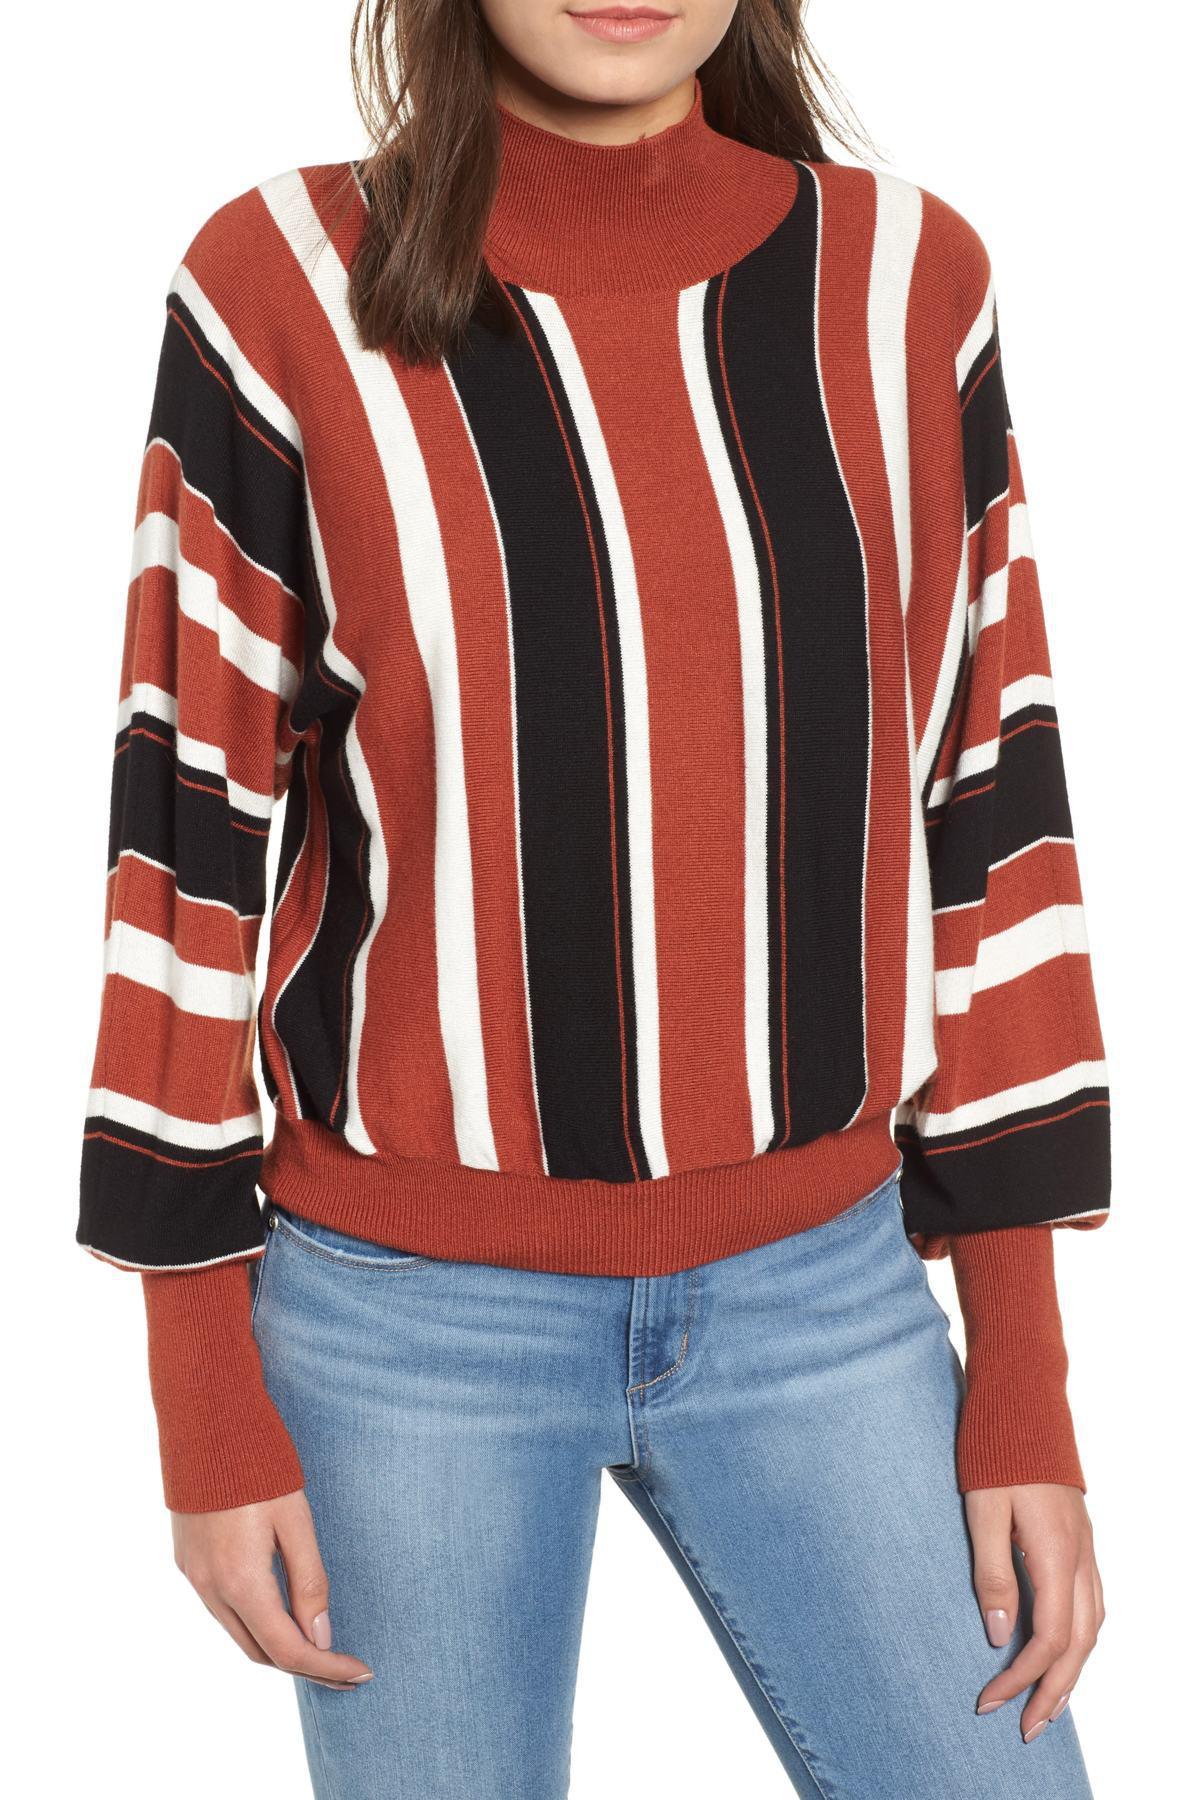 cddd1c40e Lyst - Leith Stripe Dolman Sleeve Sweater (regular   Plus Size) in ...